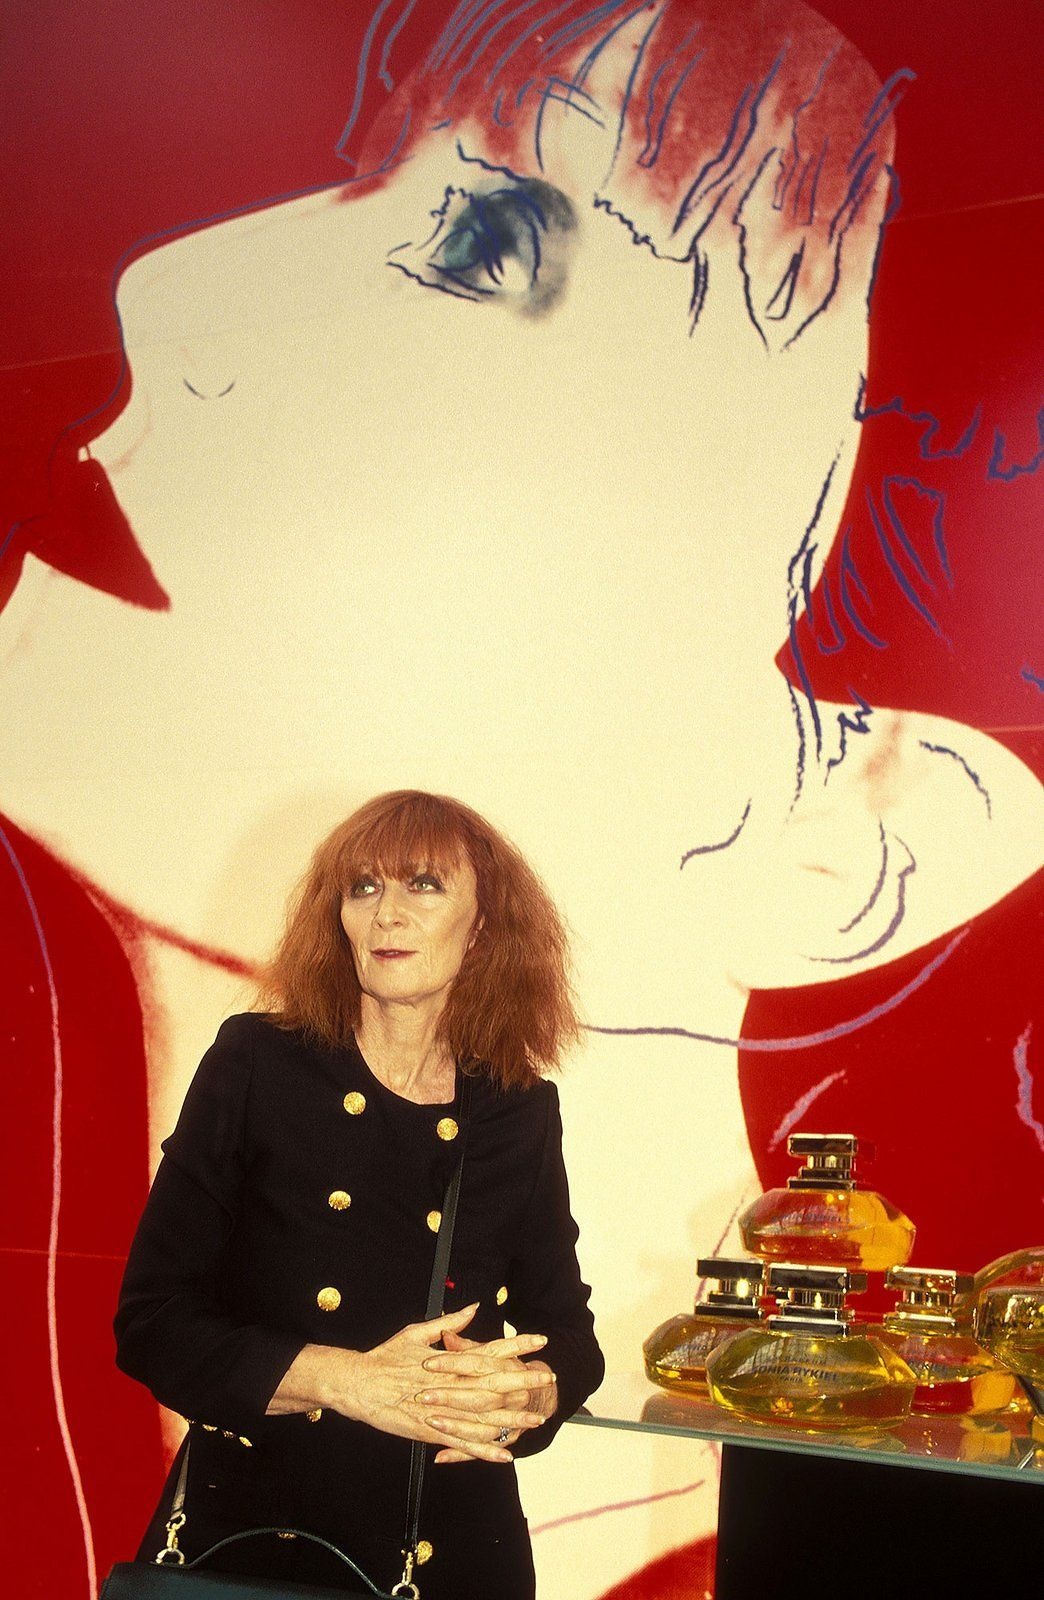 Sonia Rykiel the Iconic French Designer Dies at 86 http://ift.tt/2bQ4tRg #Vogue #Fashion